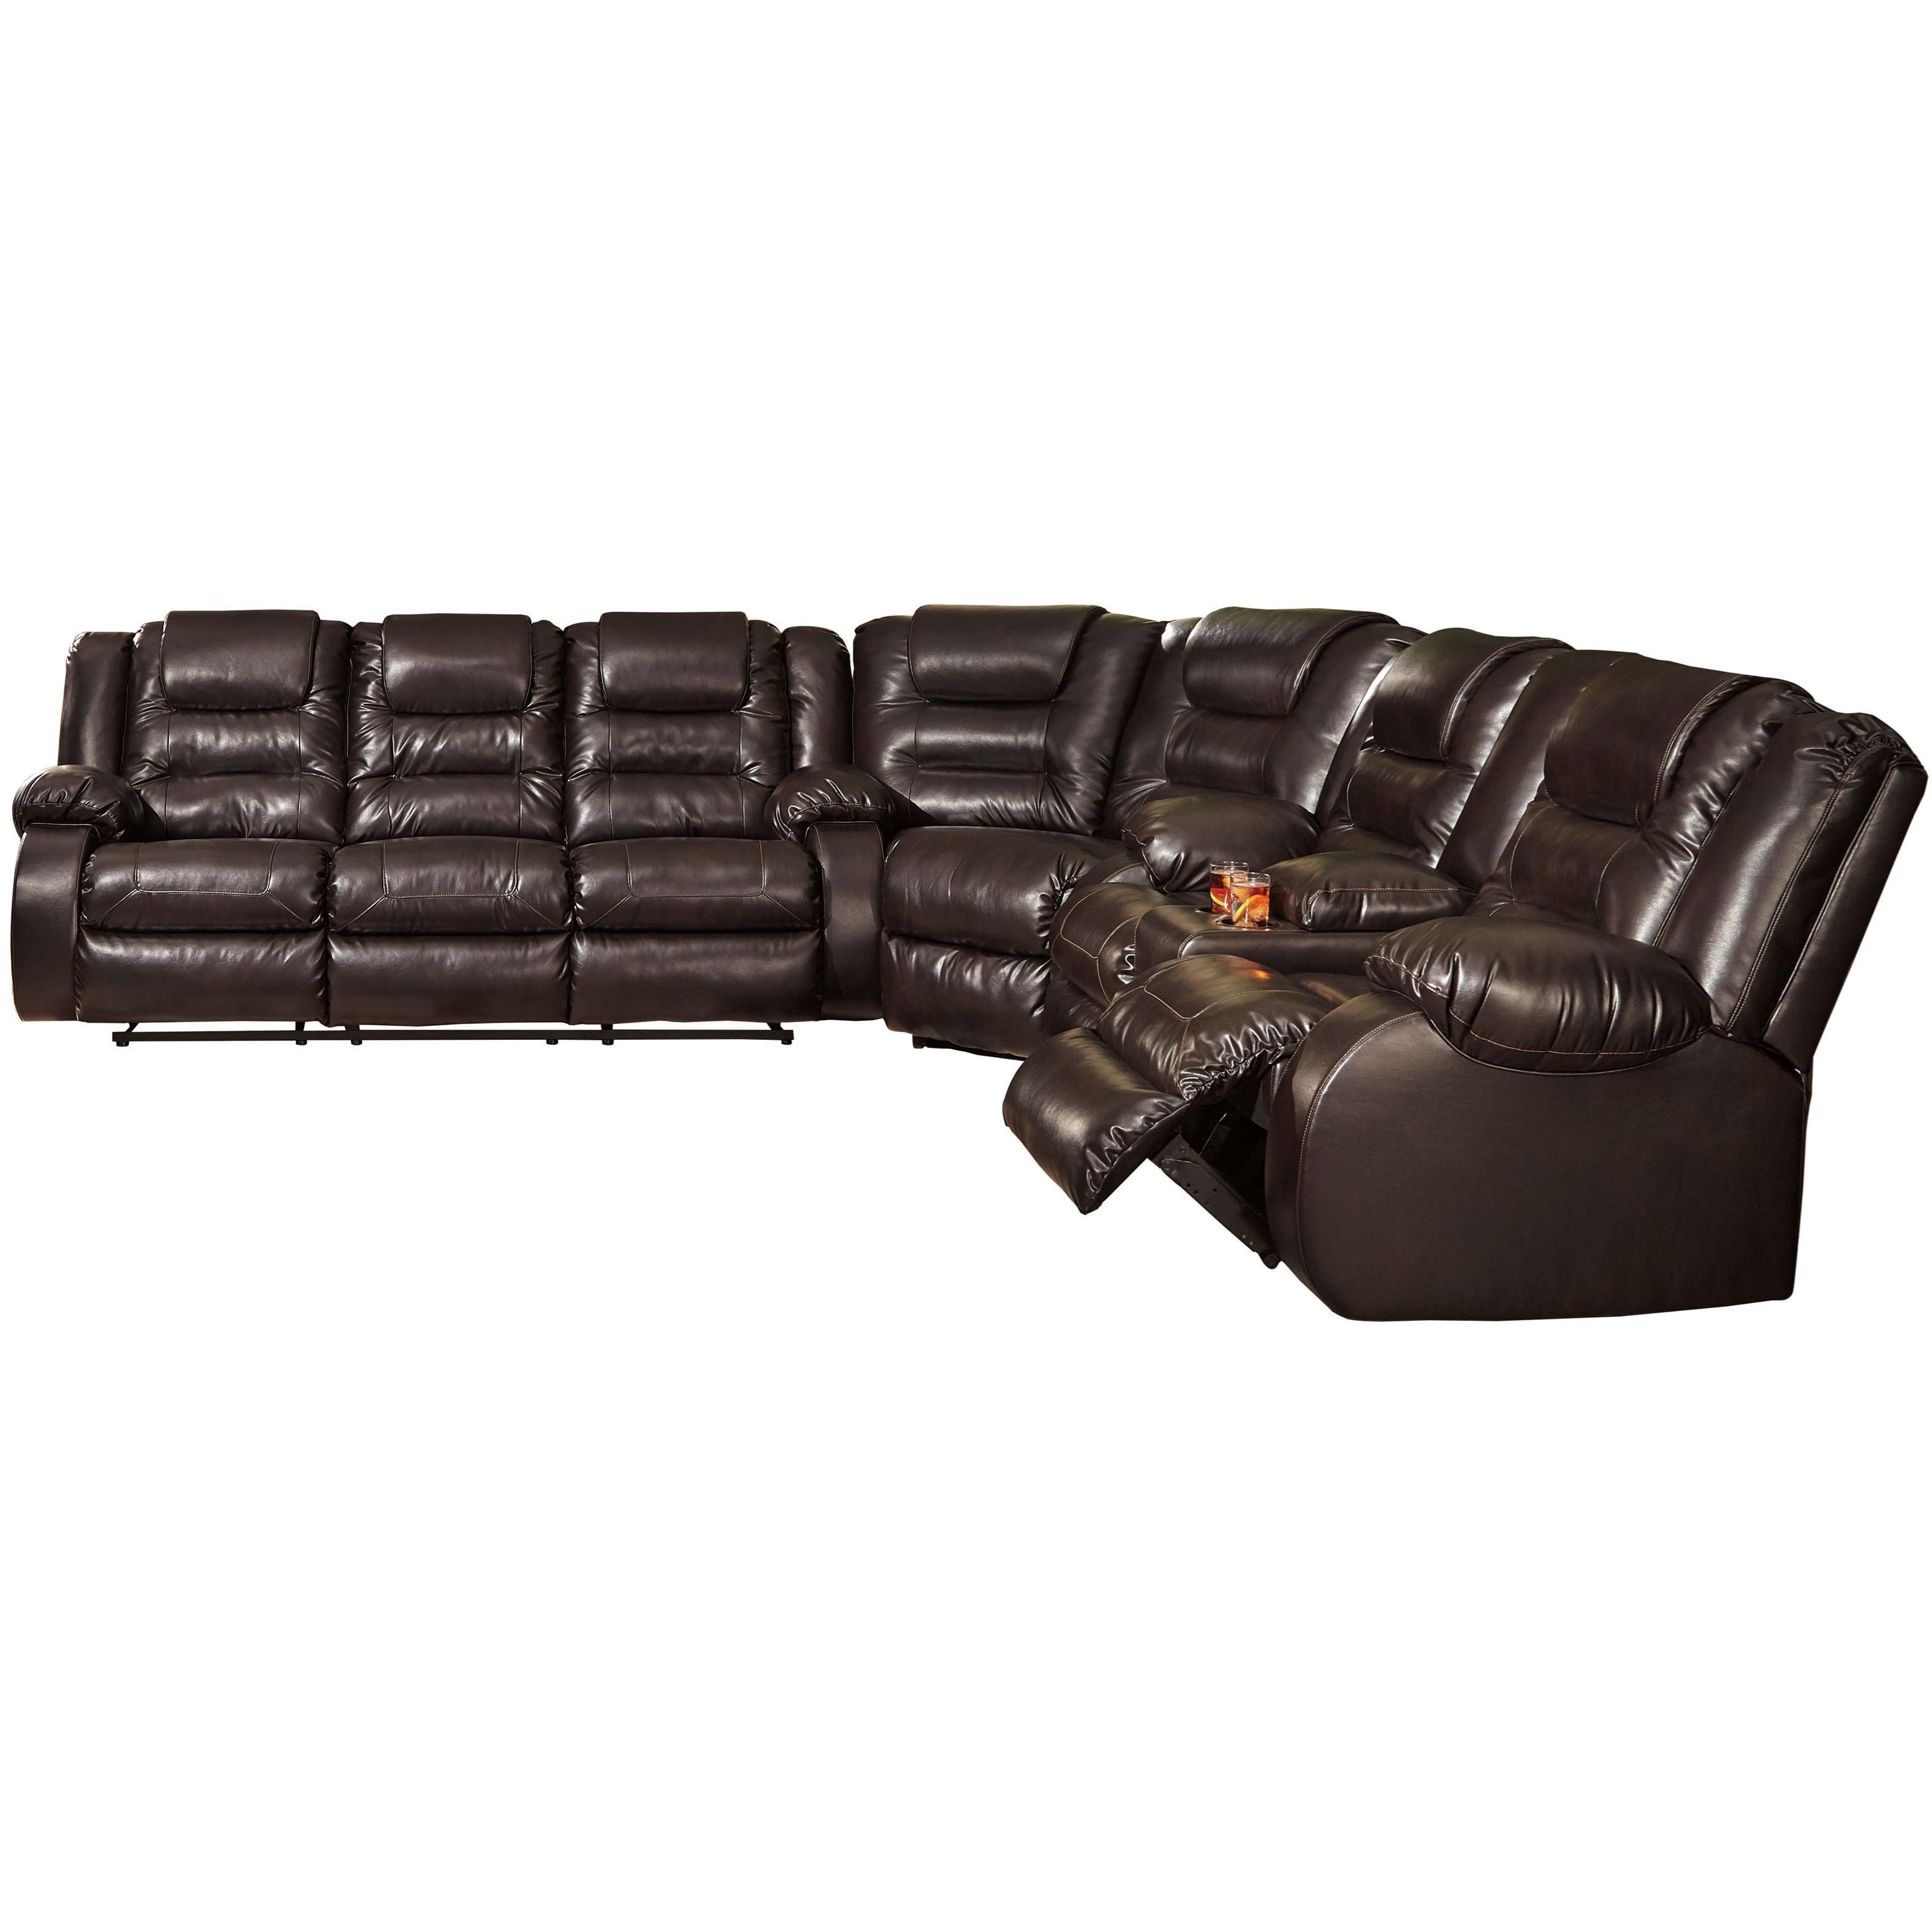 Vacherie Reclining Sectional Sofa